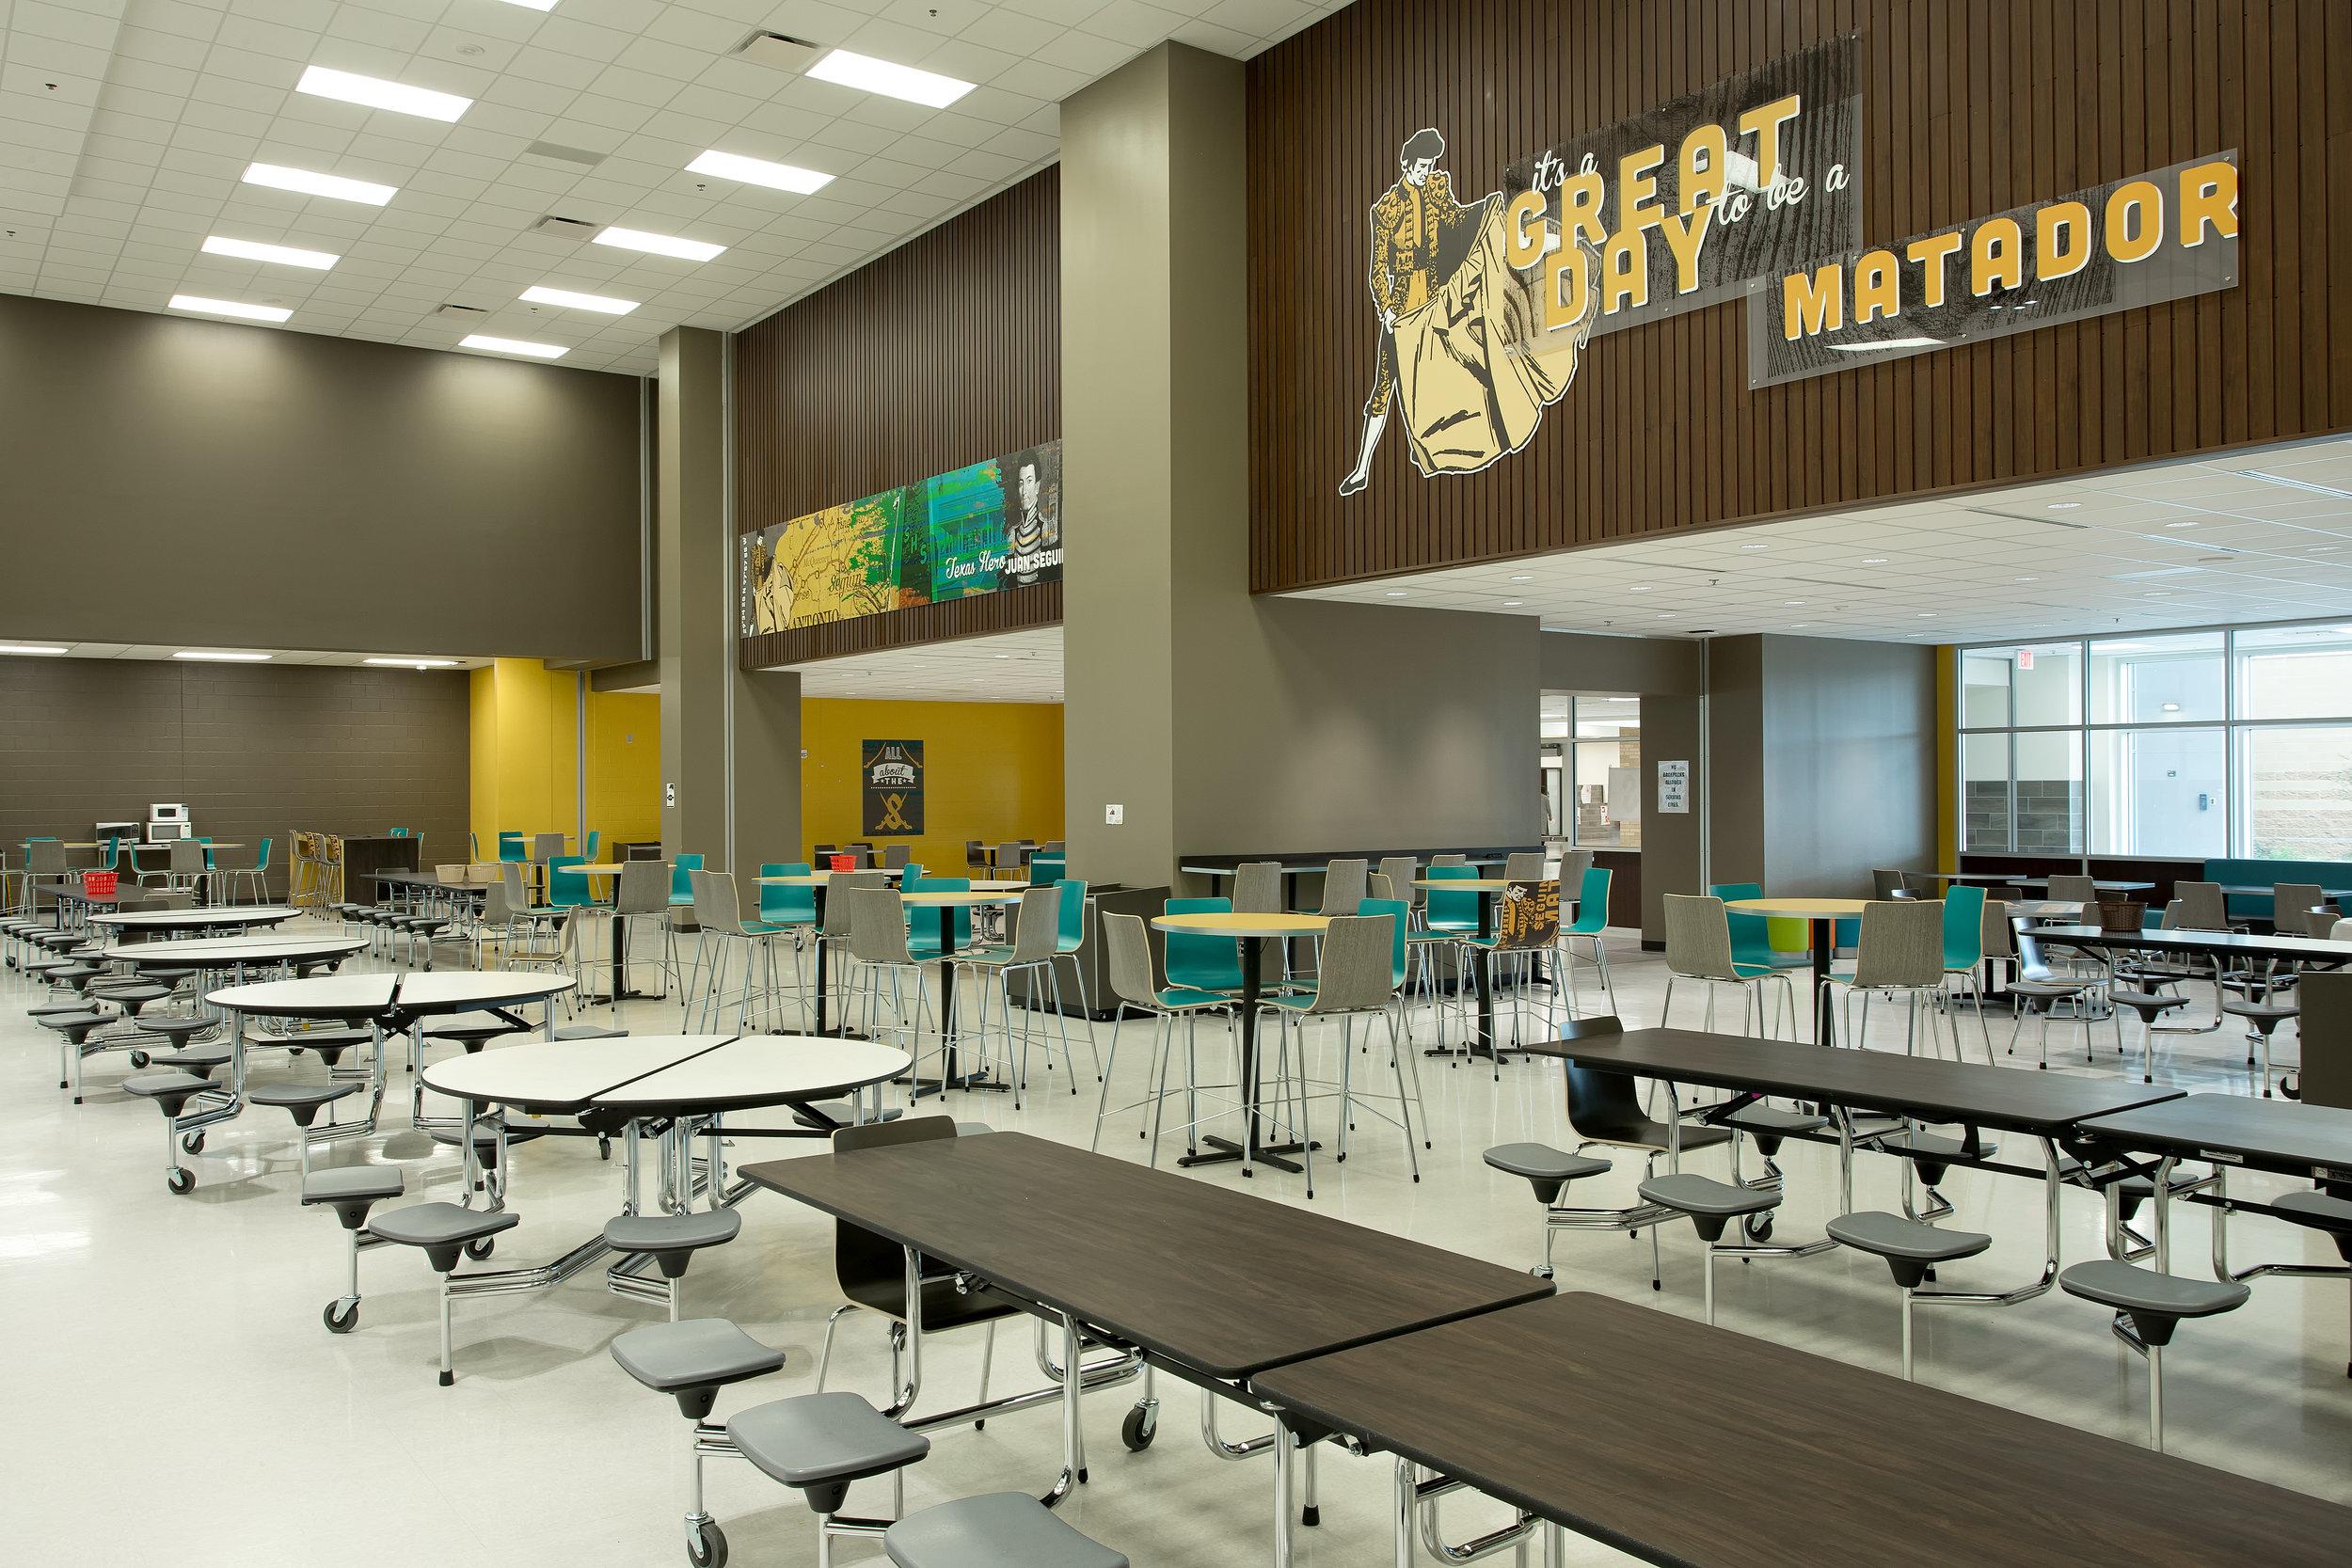 Cafeteria_01.jpg